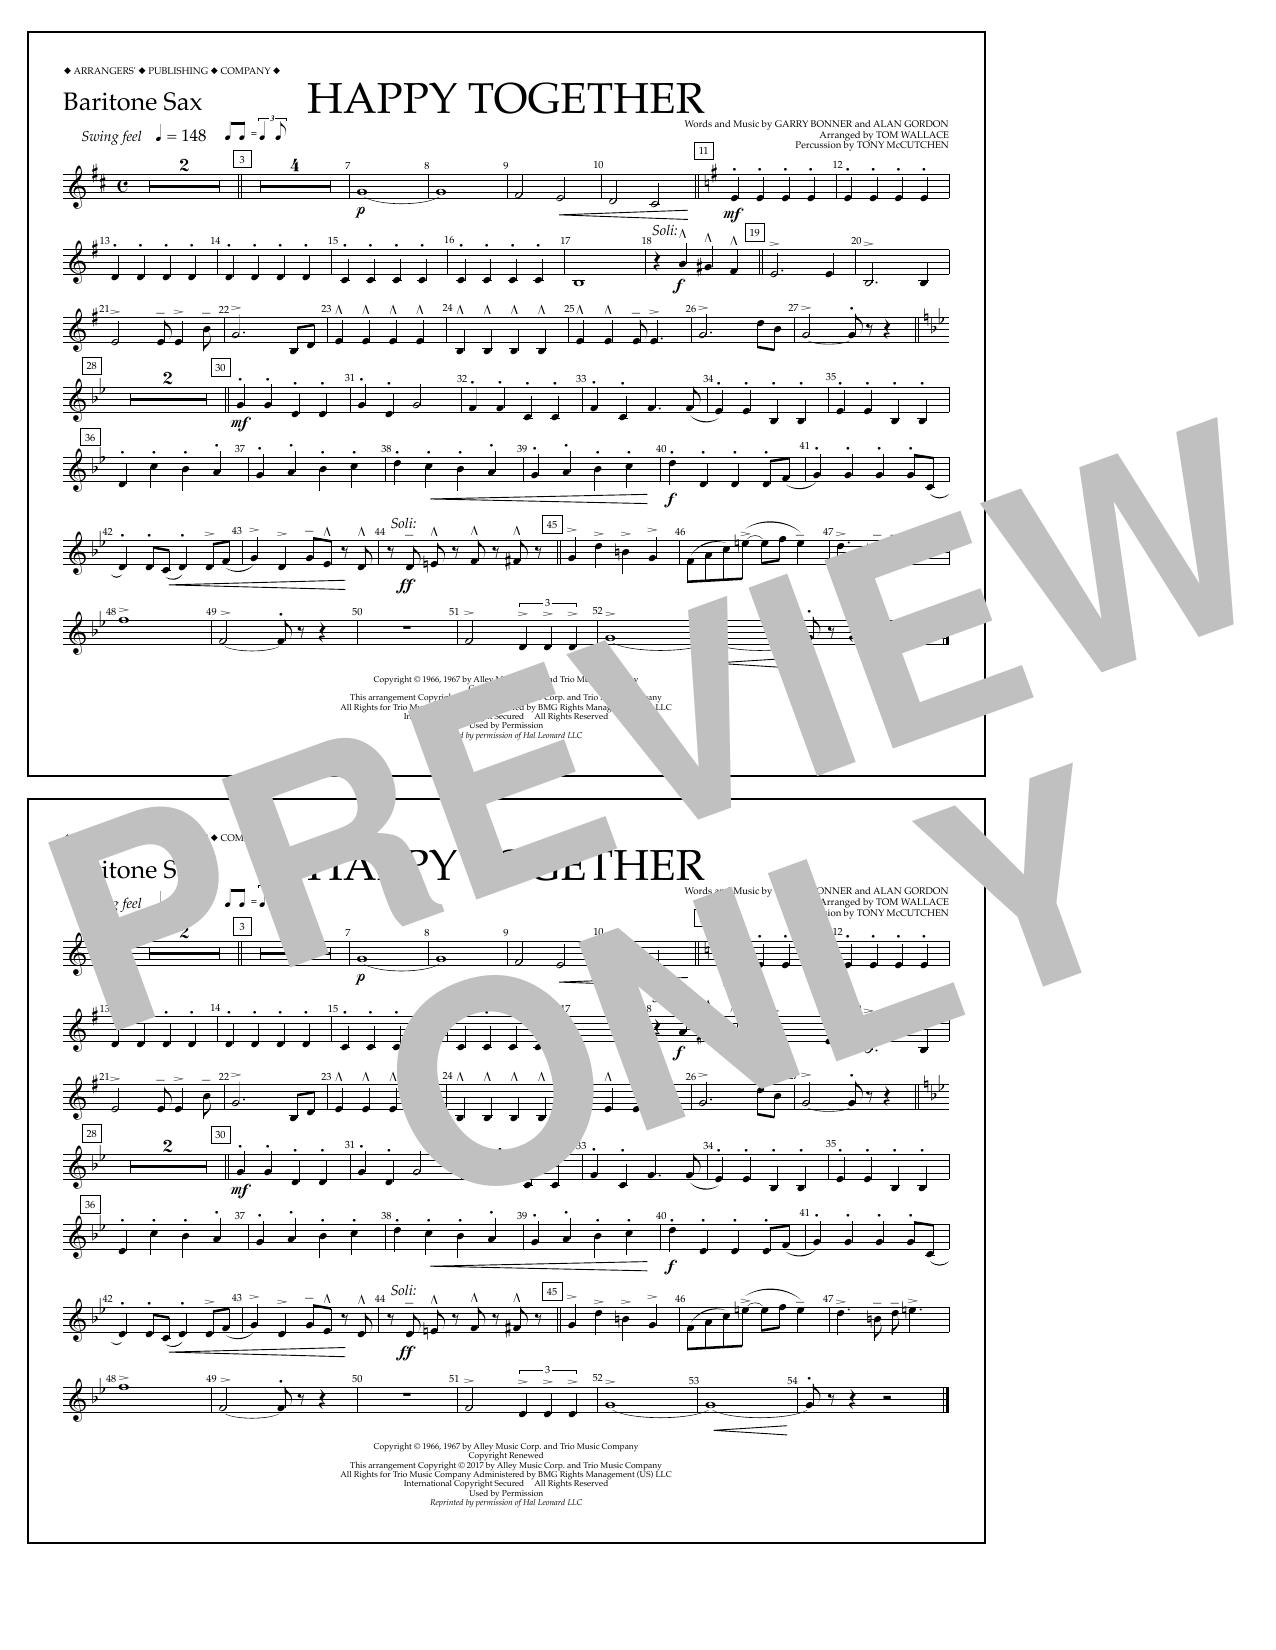 Happy Together - Baritone Sax Sheet Music